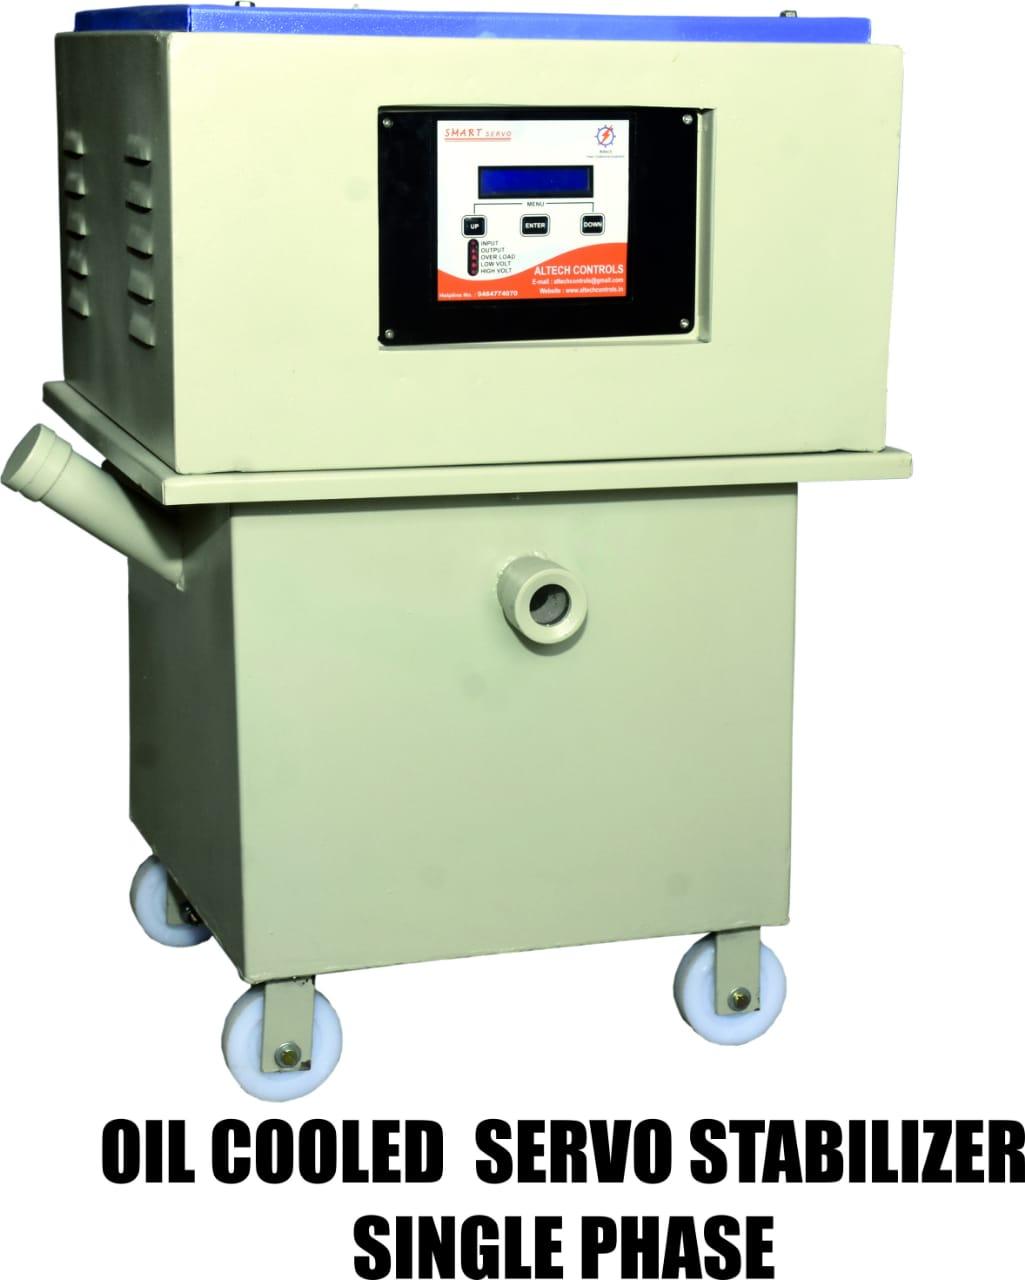 Single Phase Oil Cooled Servo Stabiliser | Altech Controls | Oil Cooled Servo Stabiliser manufacturer in Panchkula - GLK2846